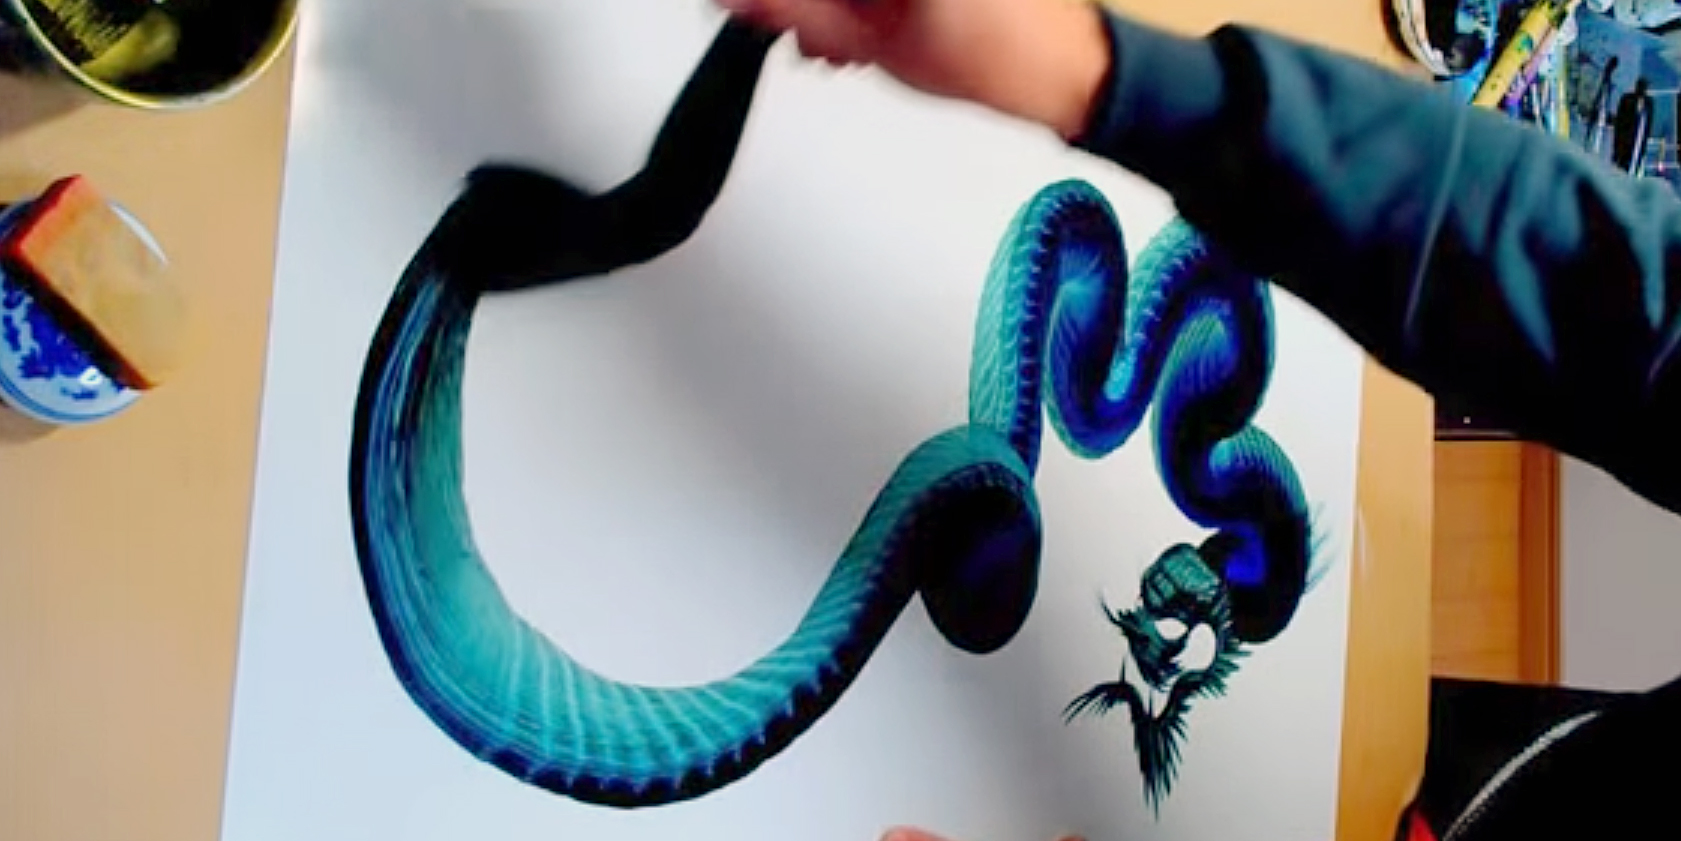 perierga.gr - Ζωγραφίζει έναν δράκο με μία… πινελιά! (βίντεο)